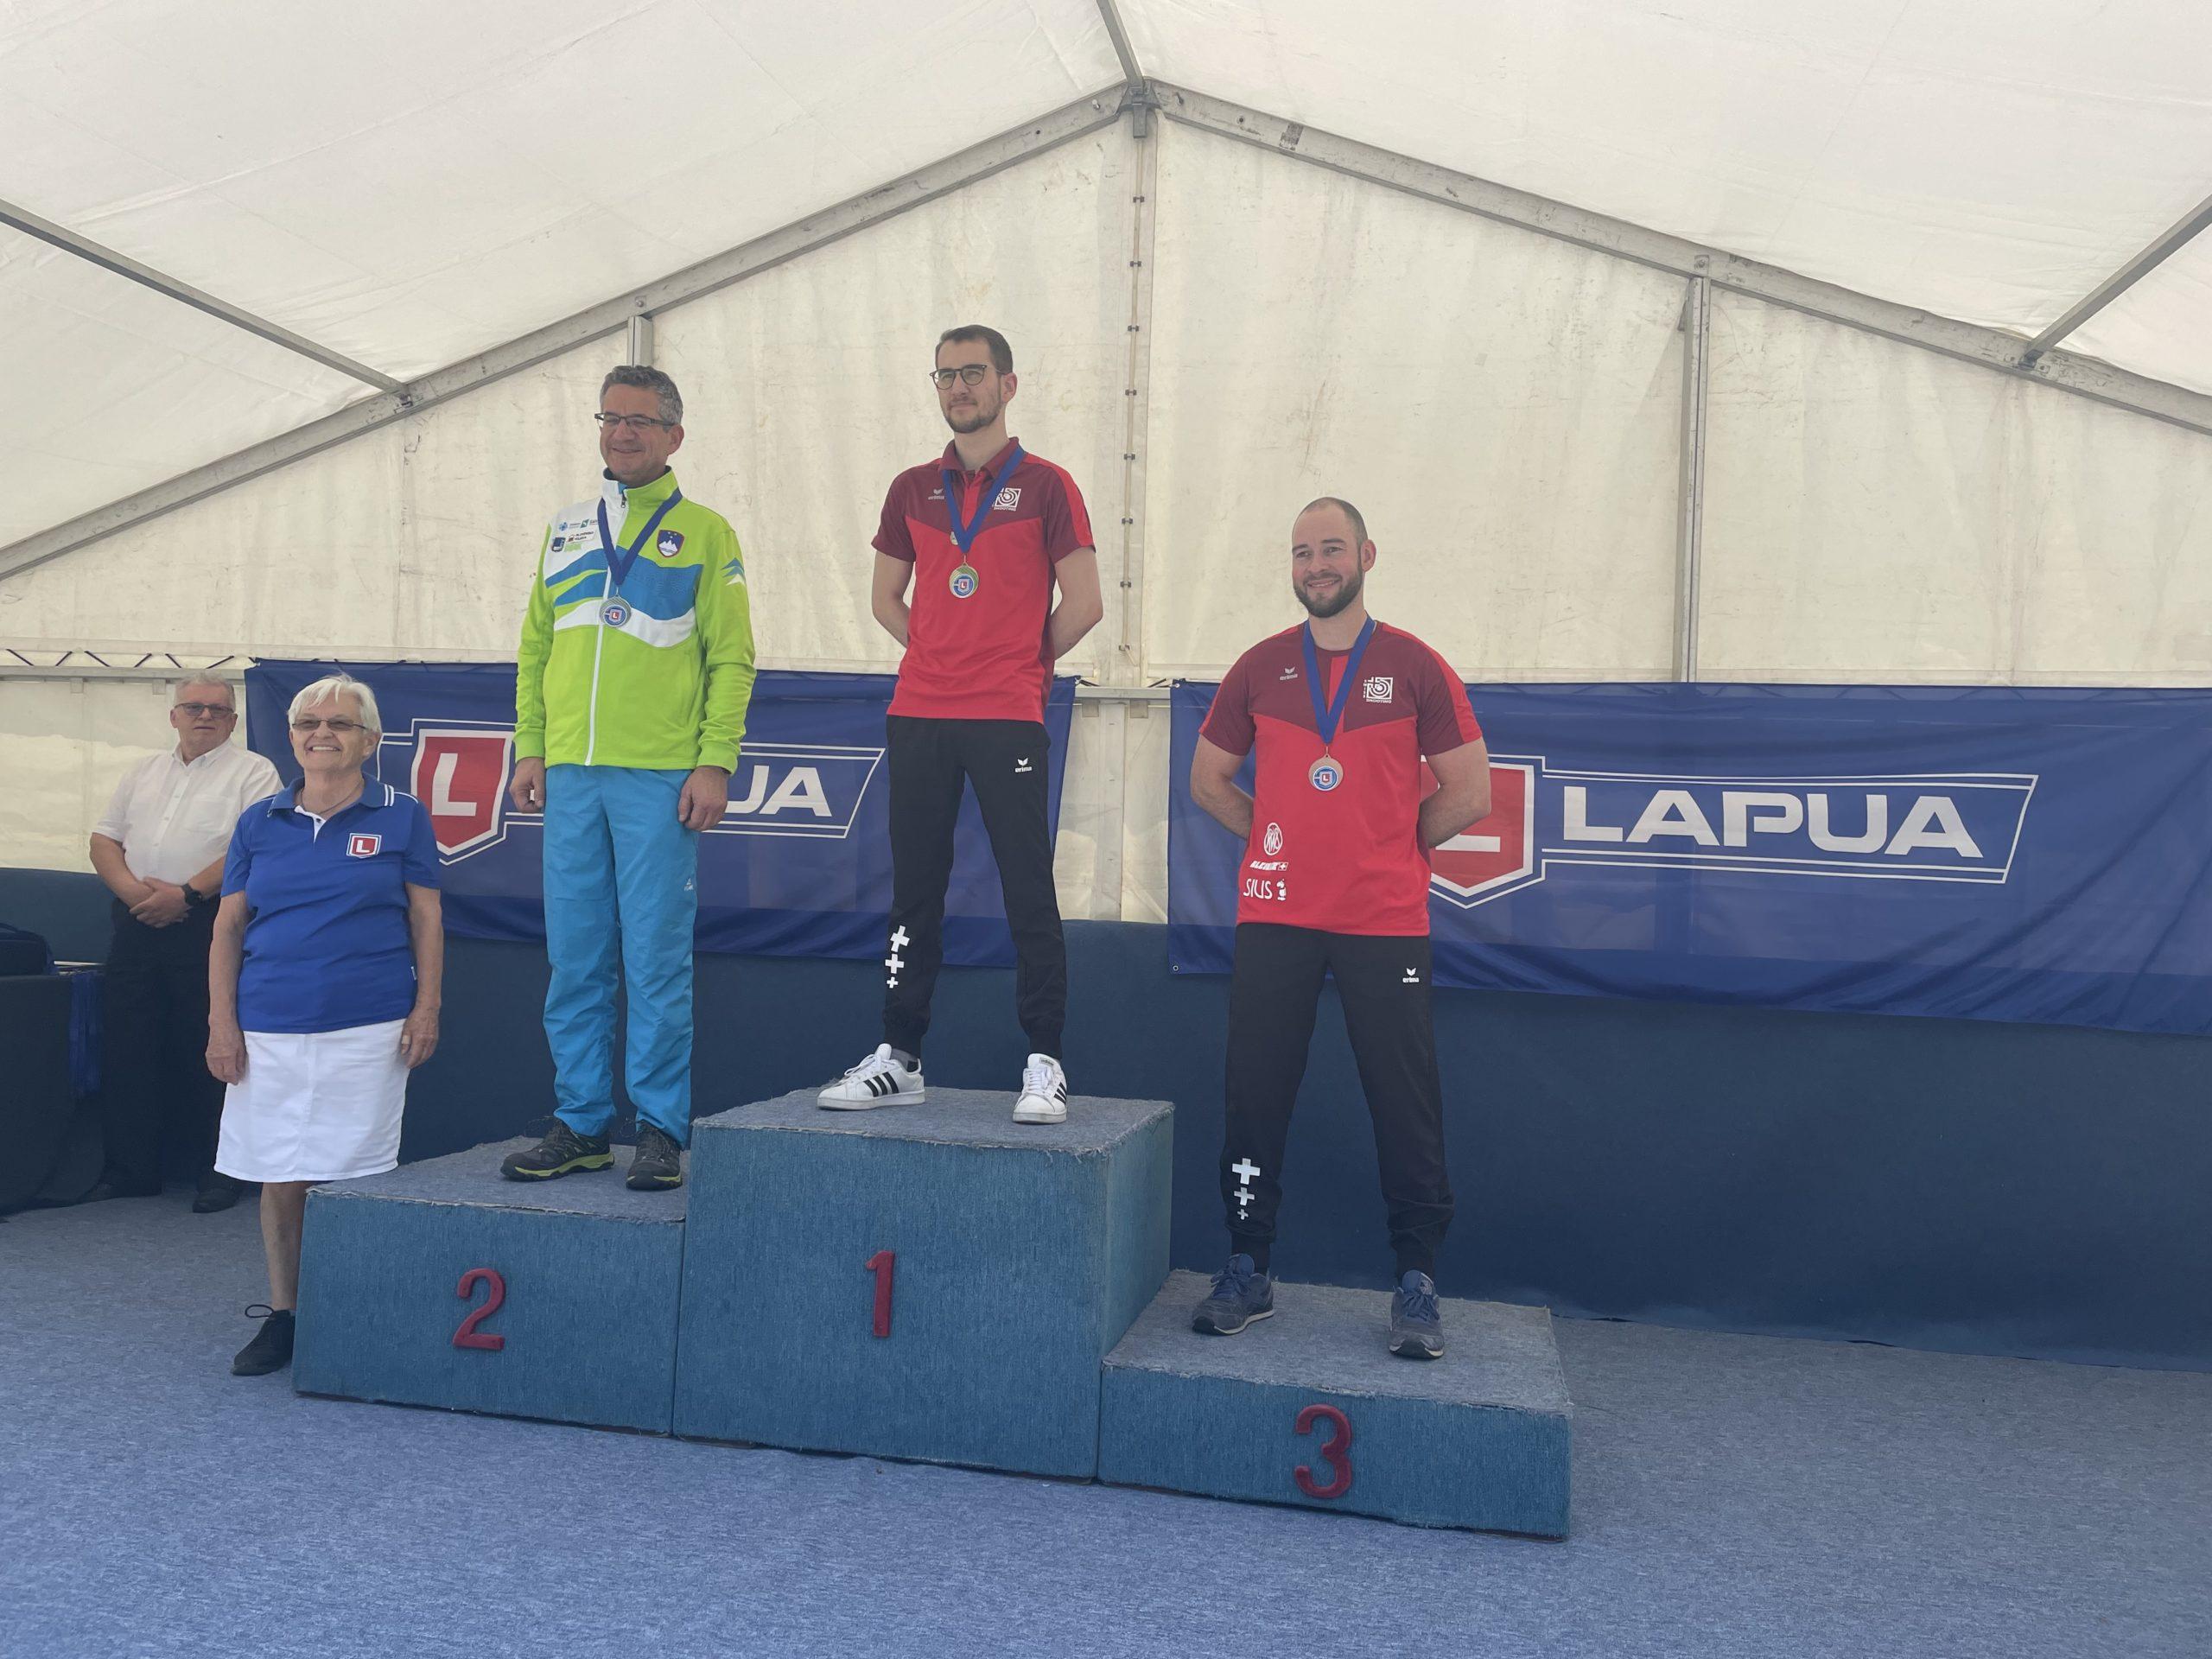 Lapua EC 300 m 21 Zagreb mens prone